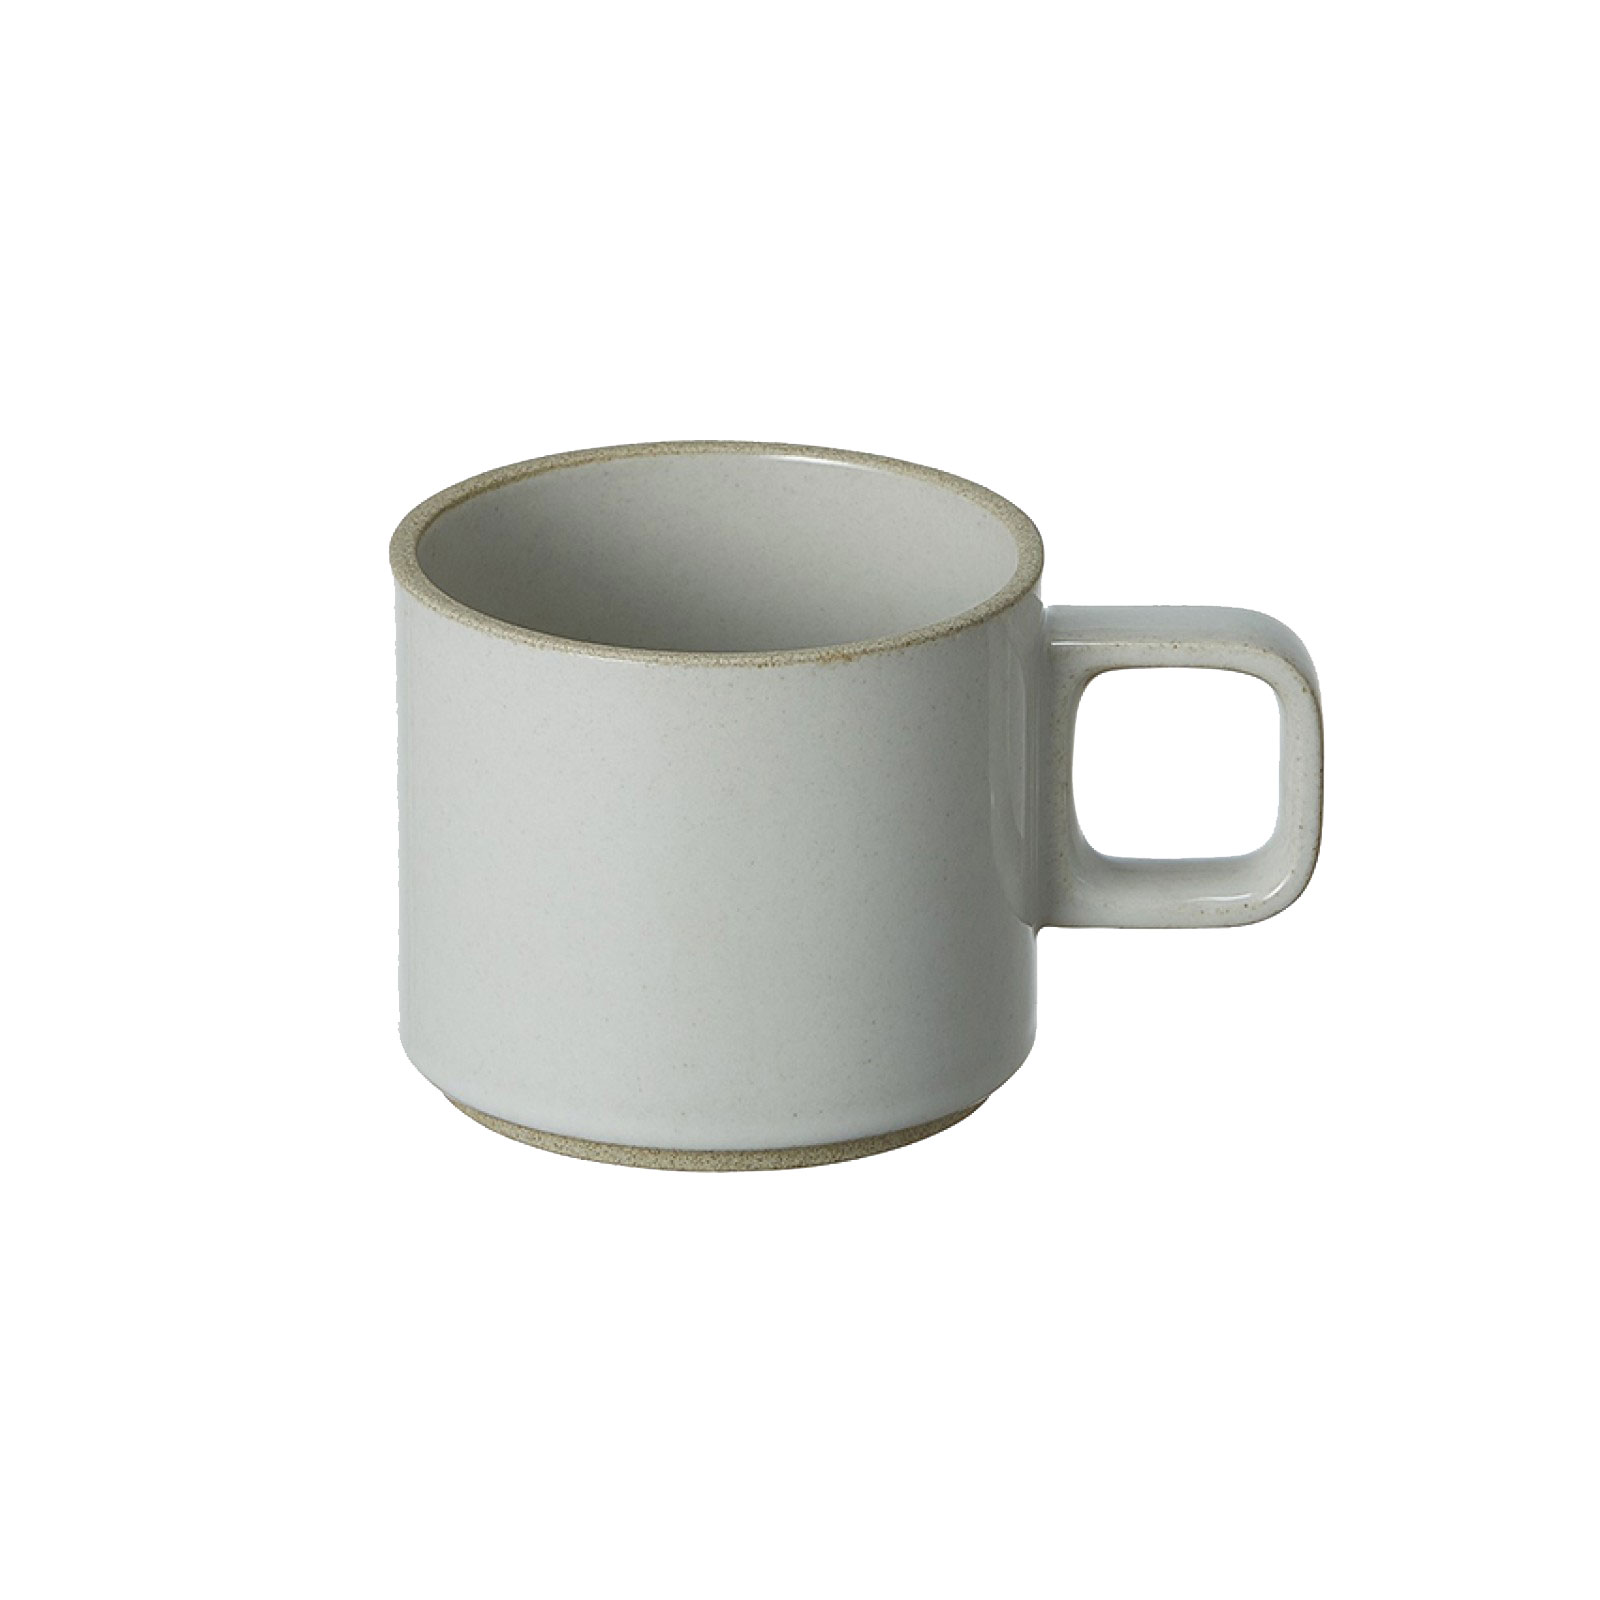 HPM019 Hasami Mug Cup low glossy